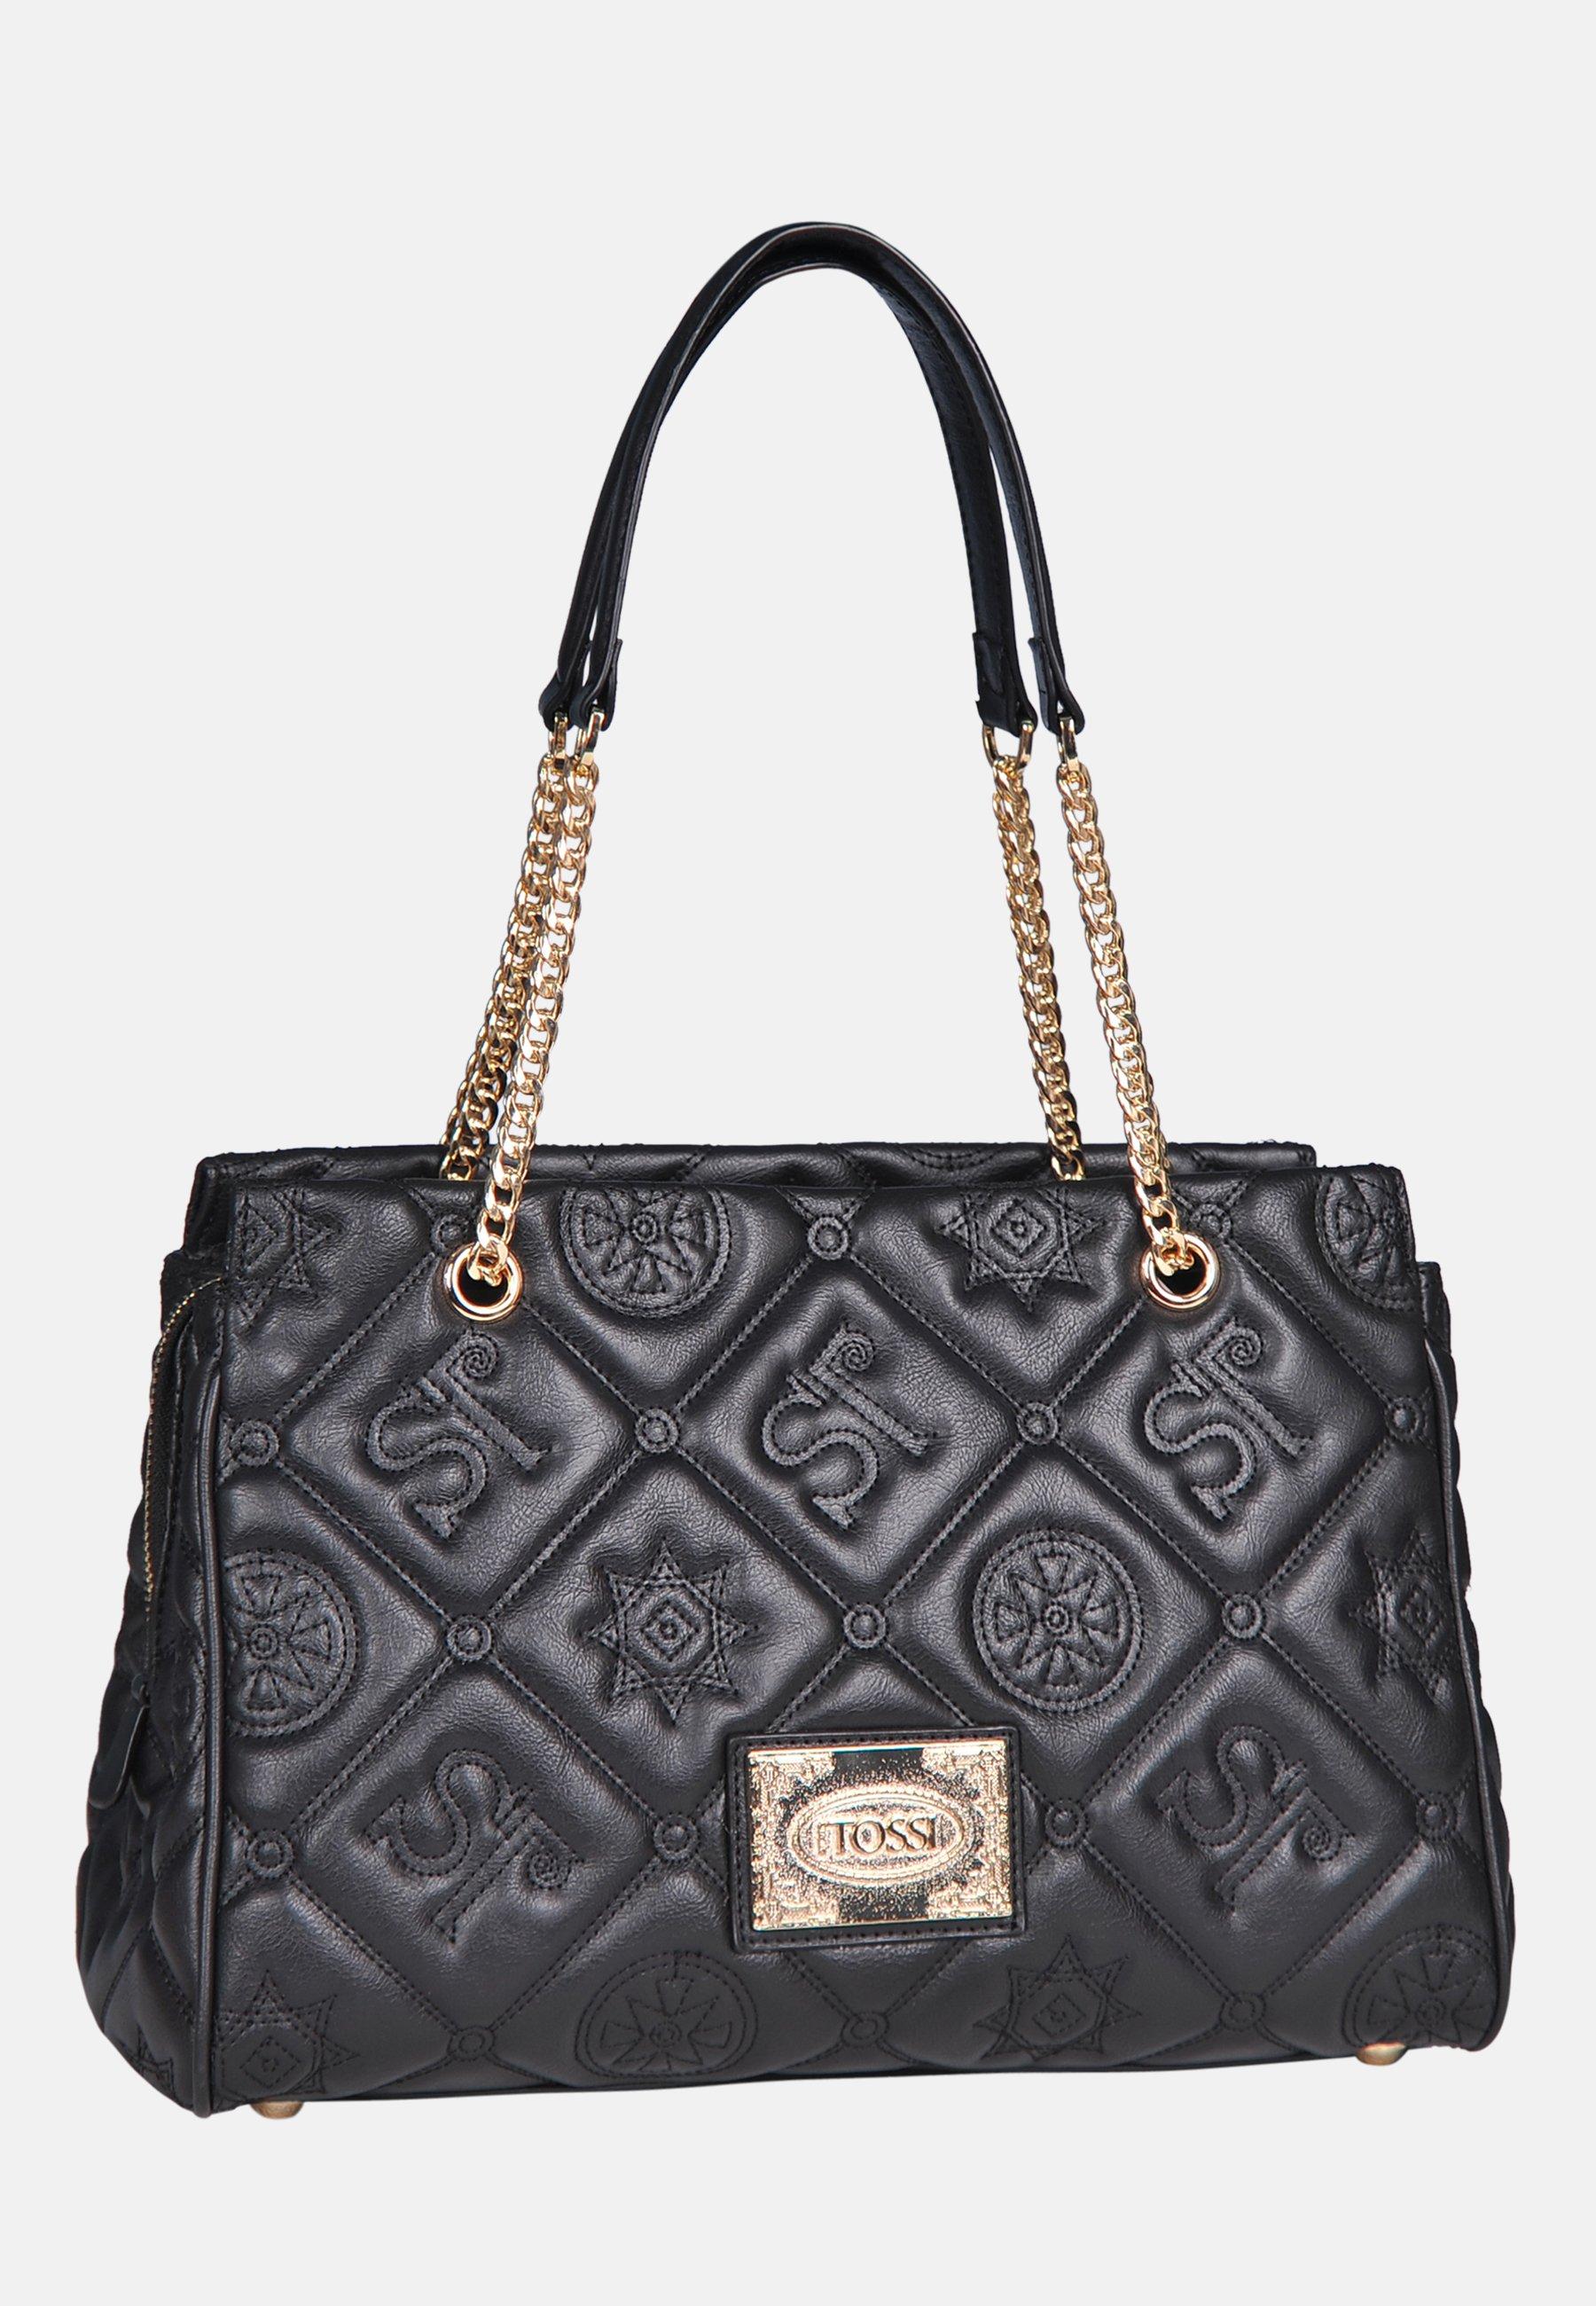 Wholesale Quality Original Accessories Silvio Tossi Handbag schwarz Y4do2weON V5kzcINYu